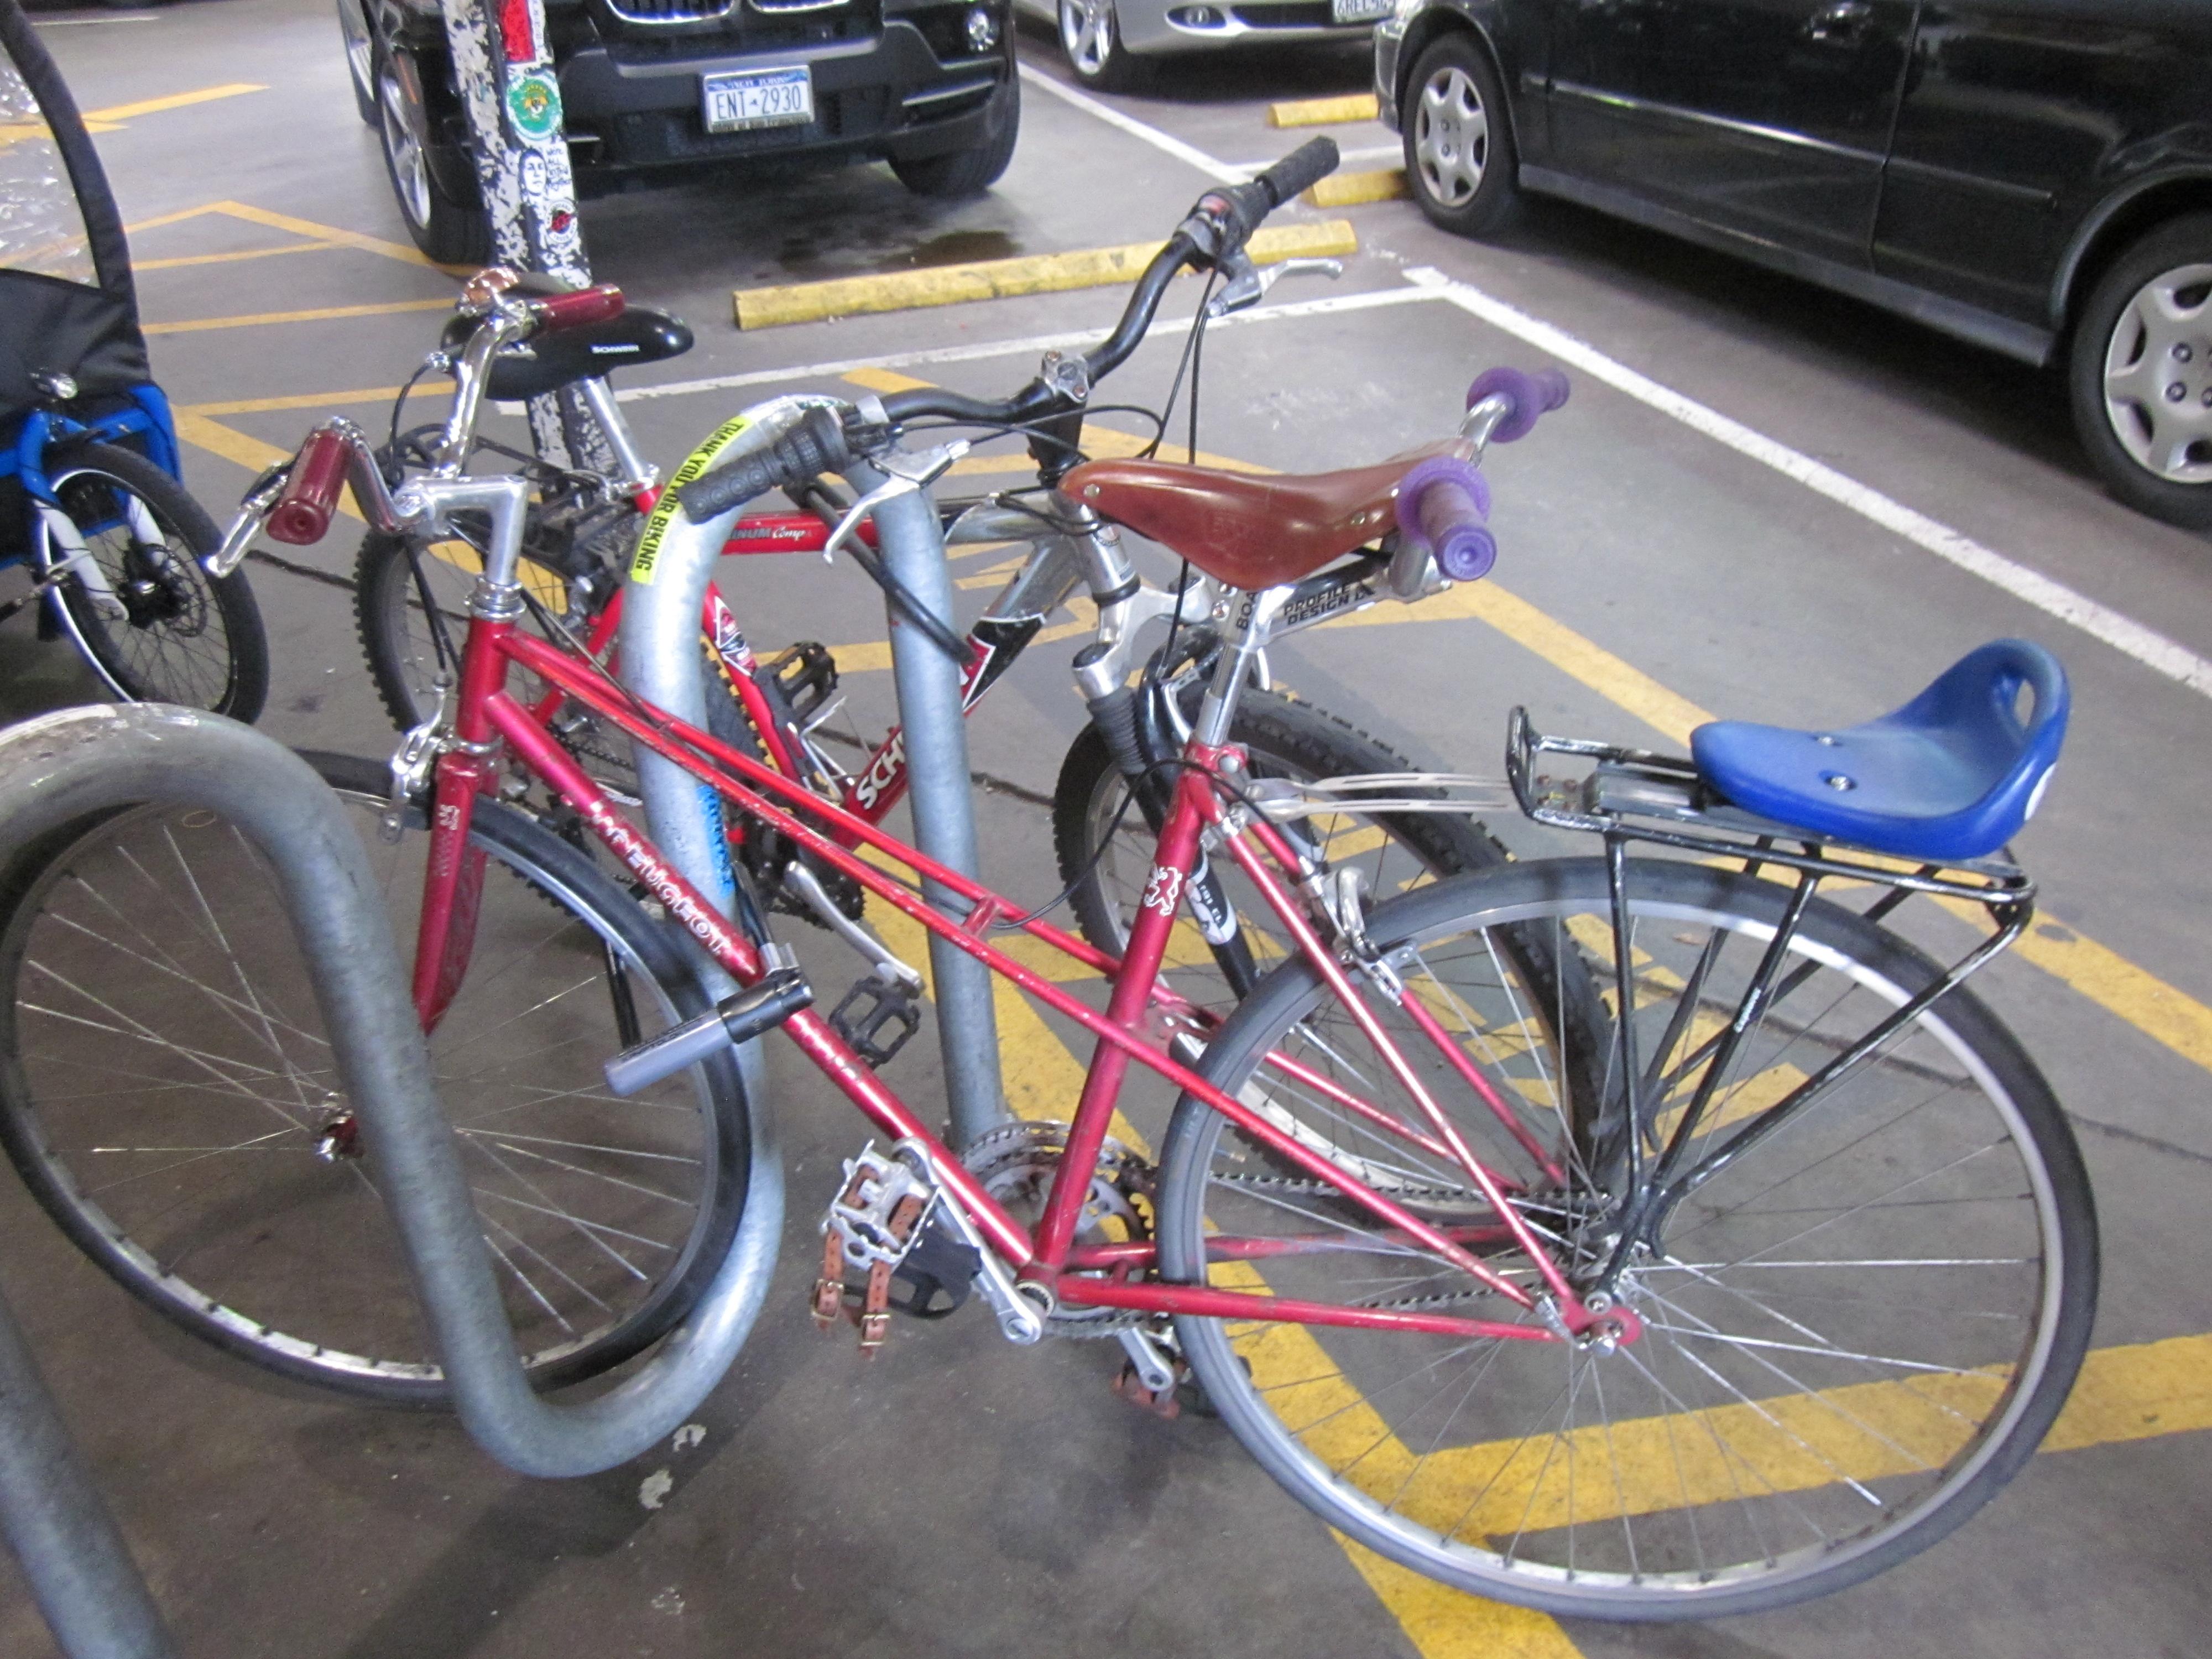 Fabricaciop Rear Bike Rack Use